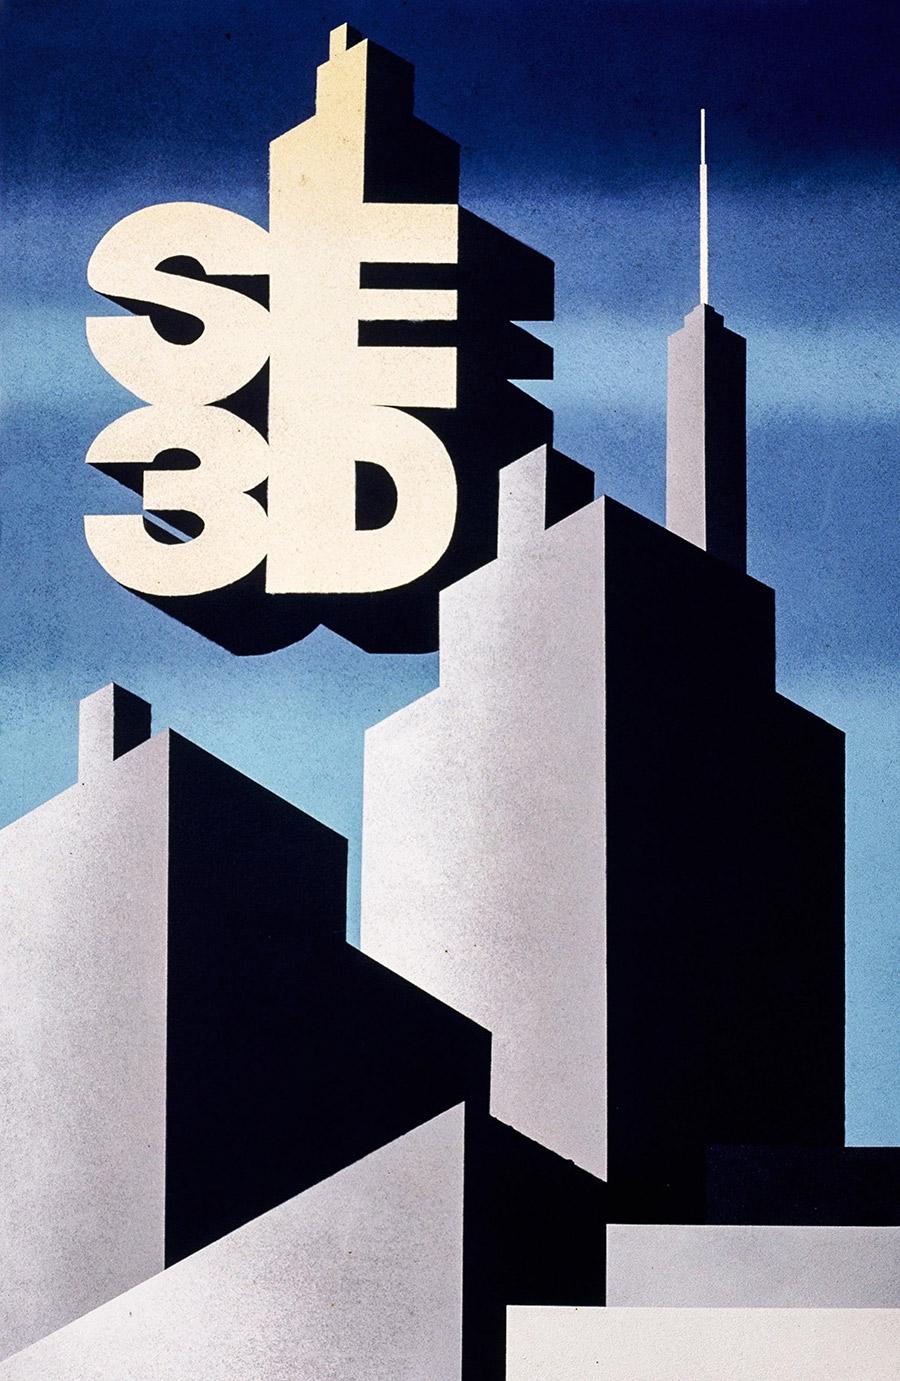 SE3D 1981